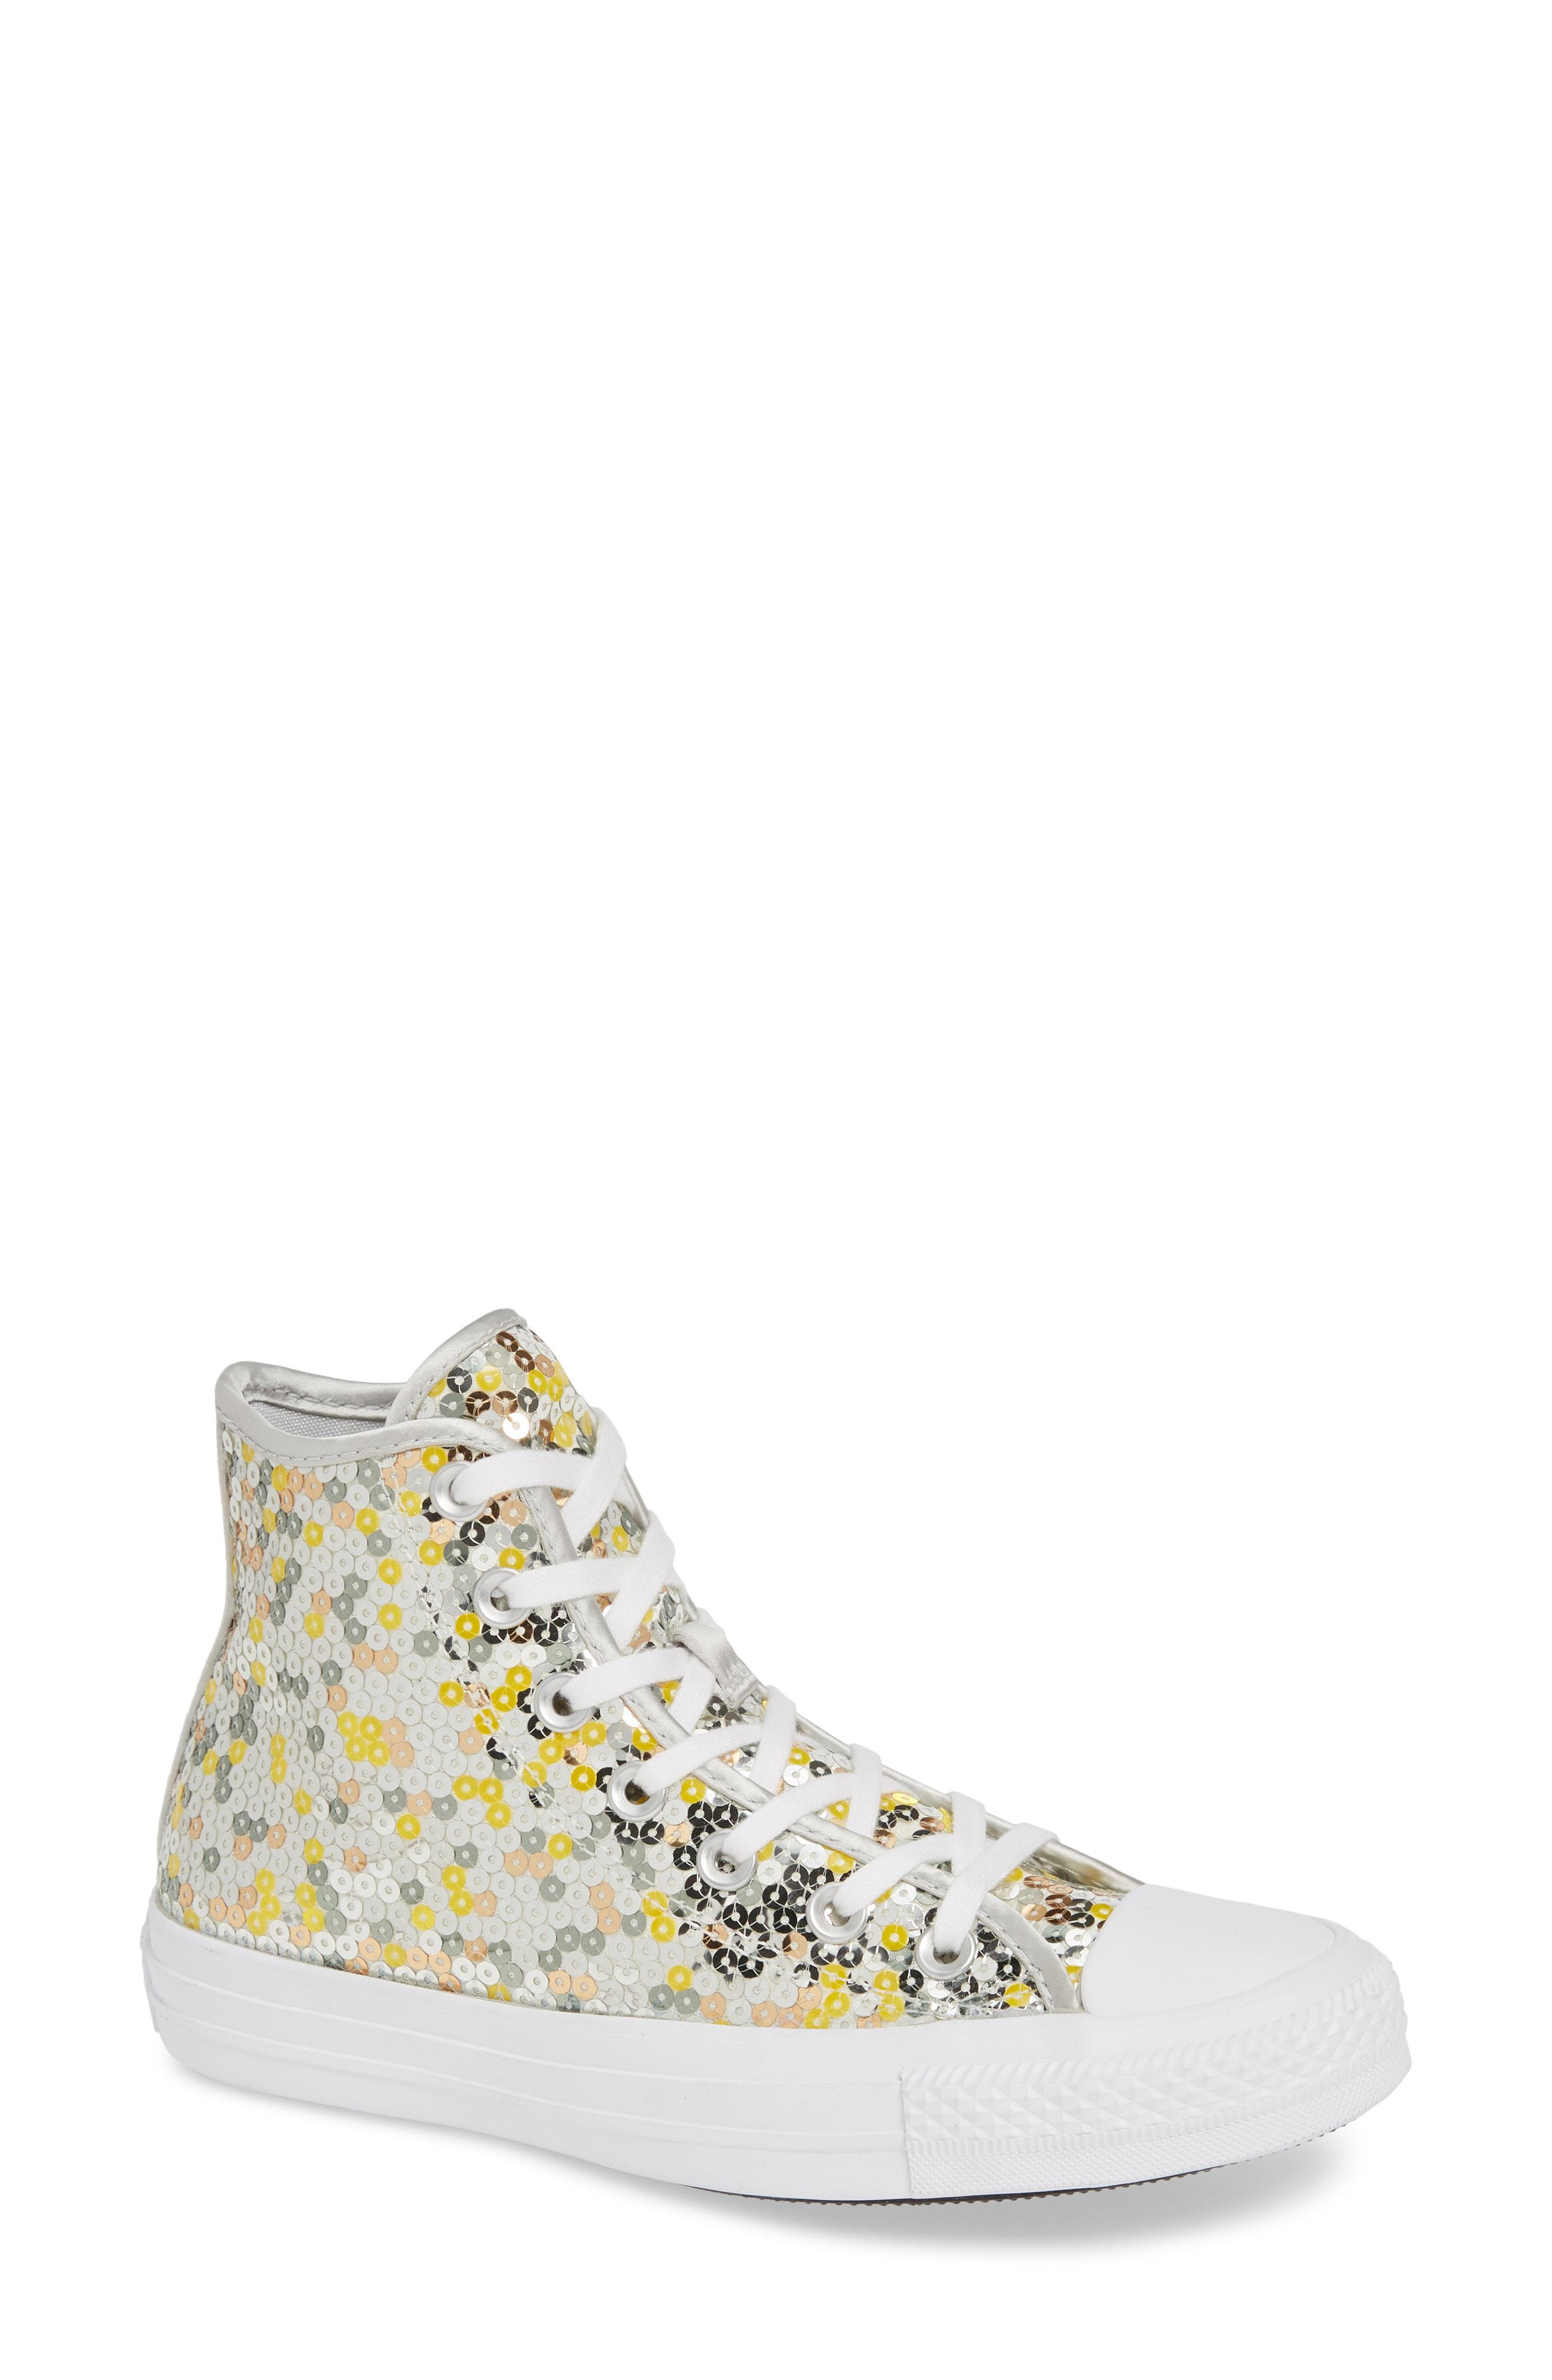 222368592990 Lyst - Converse Chuck Taylor All Star Sequin High Top Sneaker